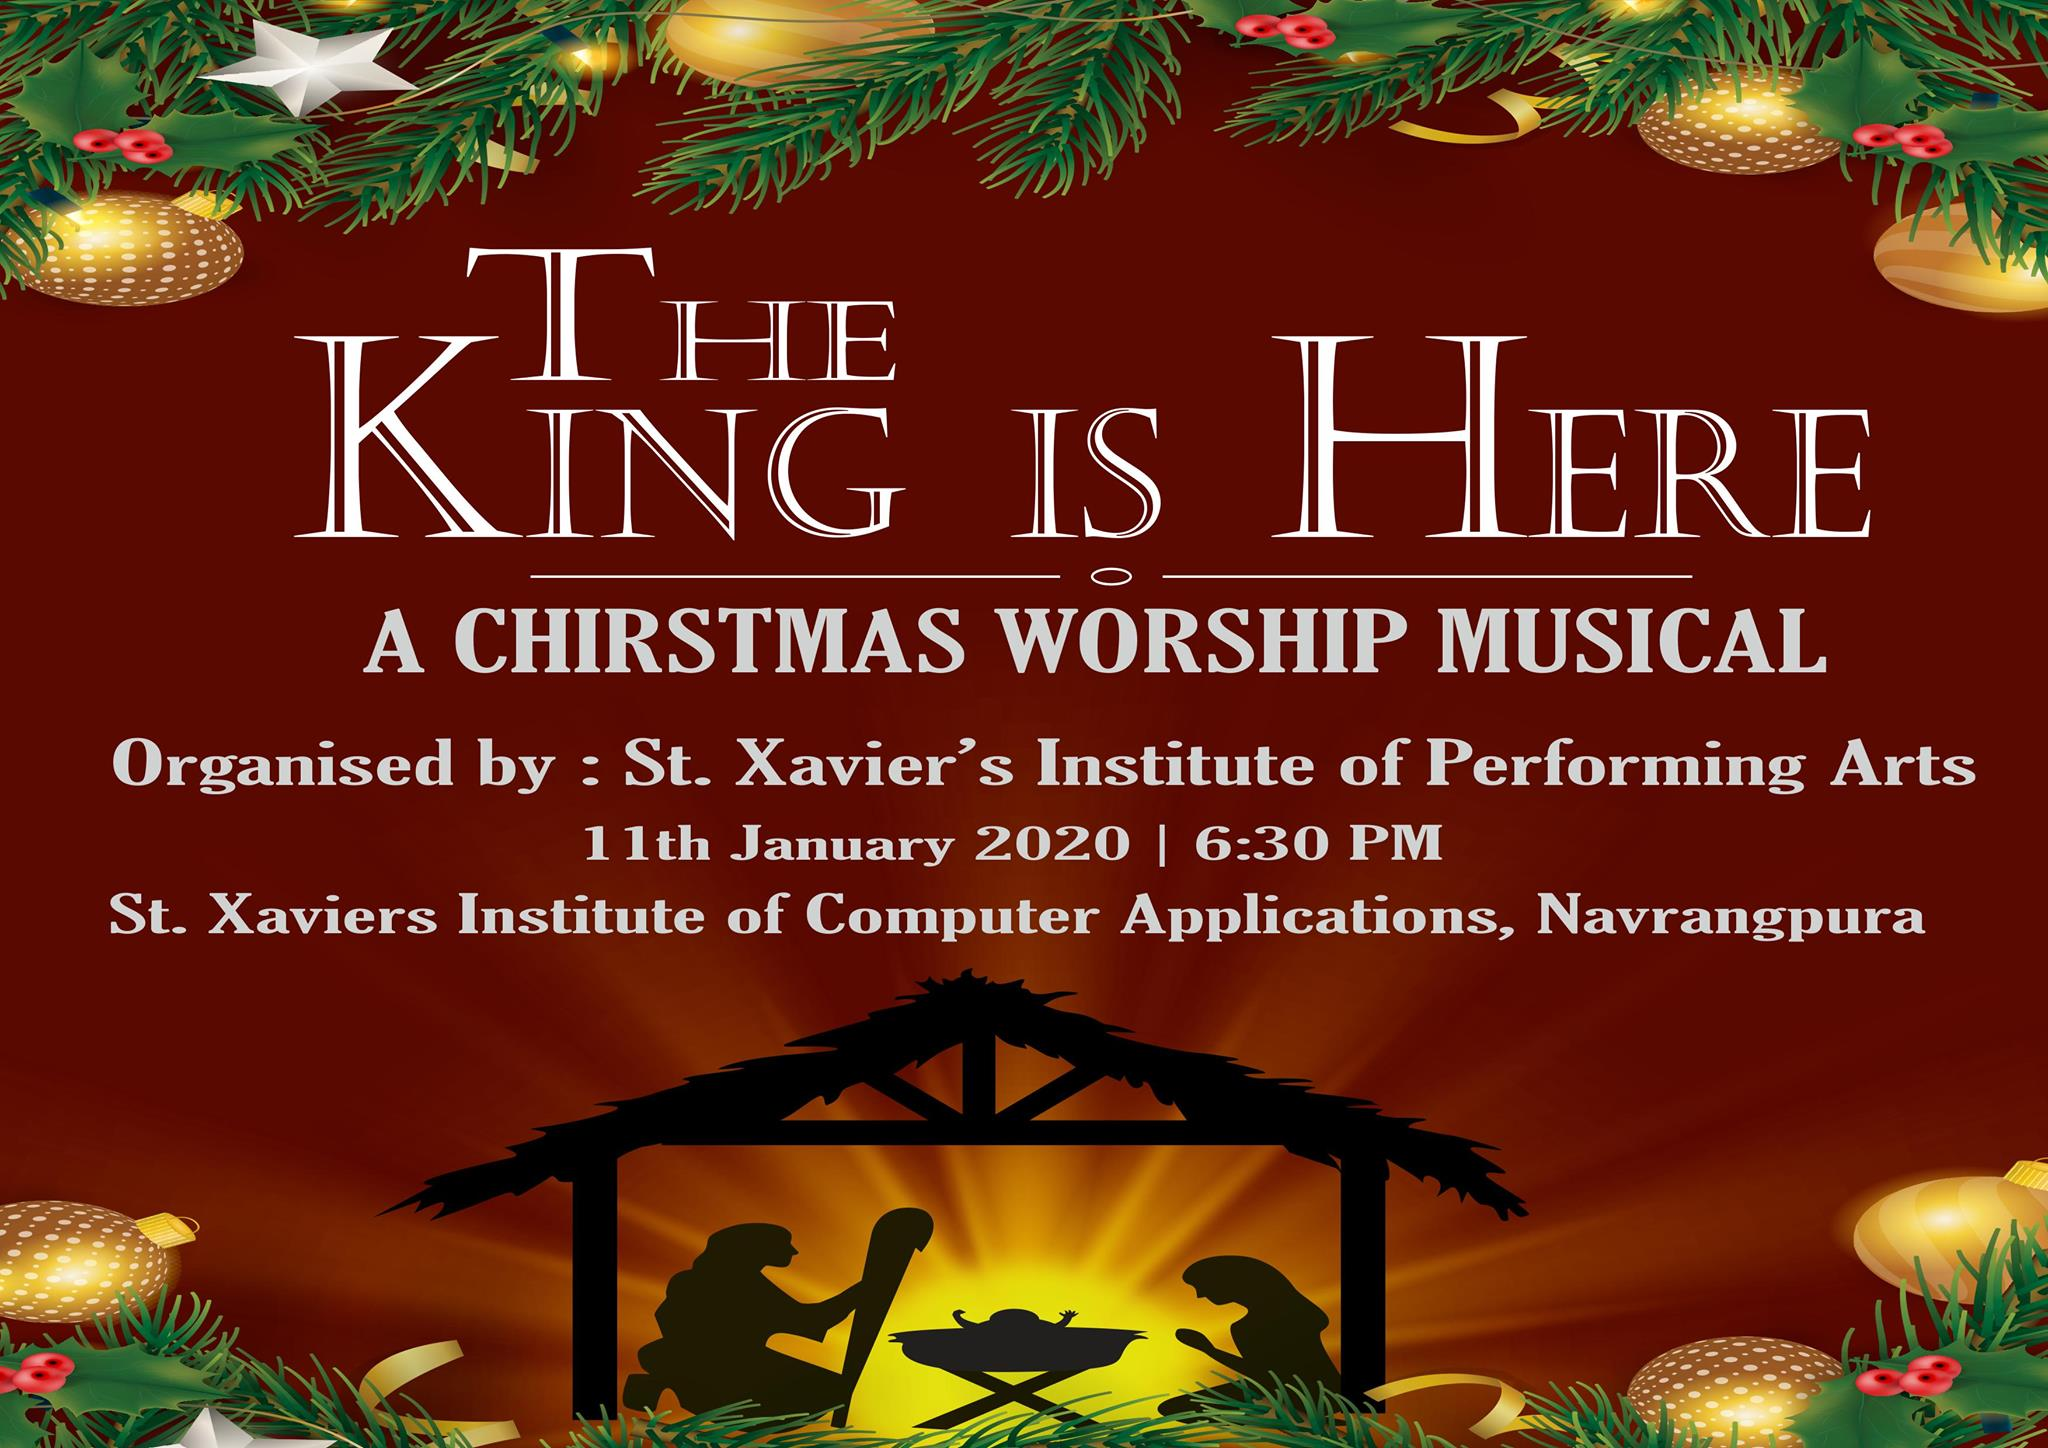 Kool 108 Stop Christmas Music 2021 The King Is Here A Christmas Worship Musical Creative Yatra